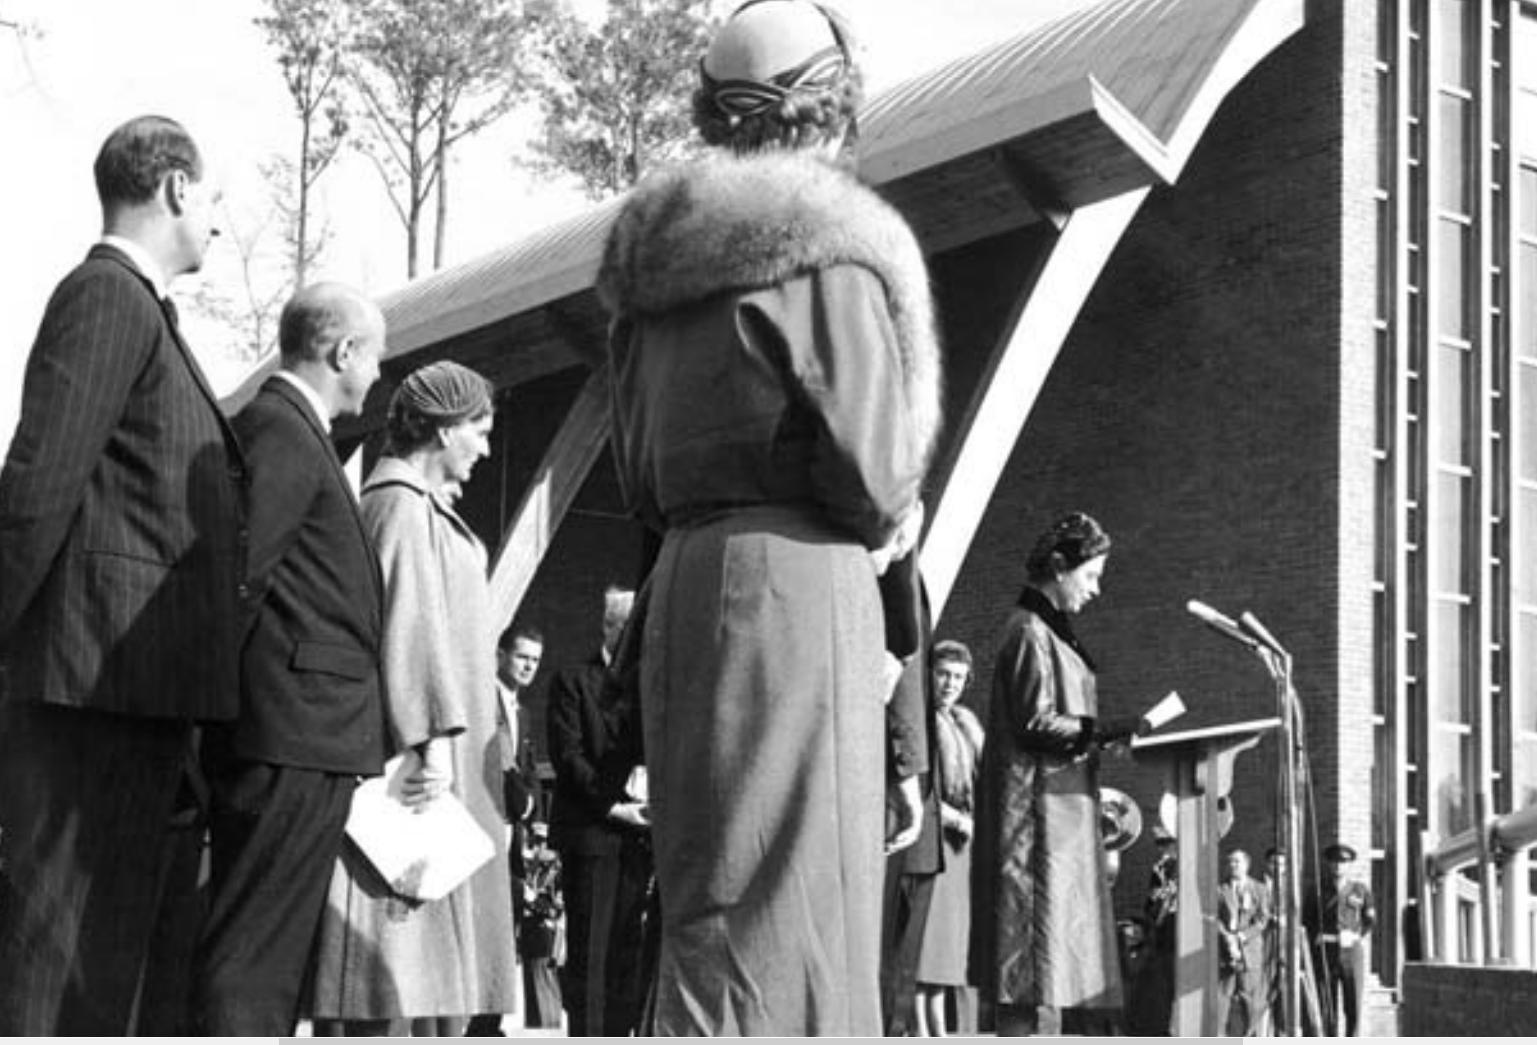 Her Majesty Queen Elizabeth II addressed an estimated 25,000 at Jamestown Festival Park on October 16, 1957.